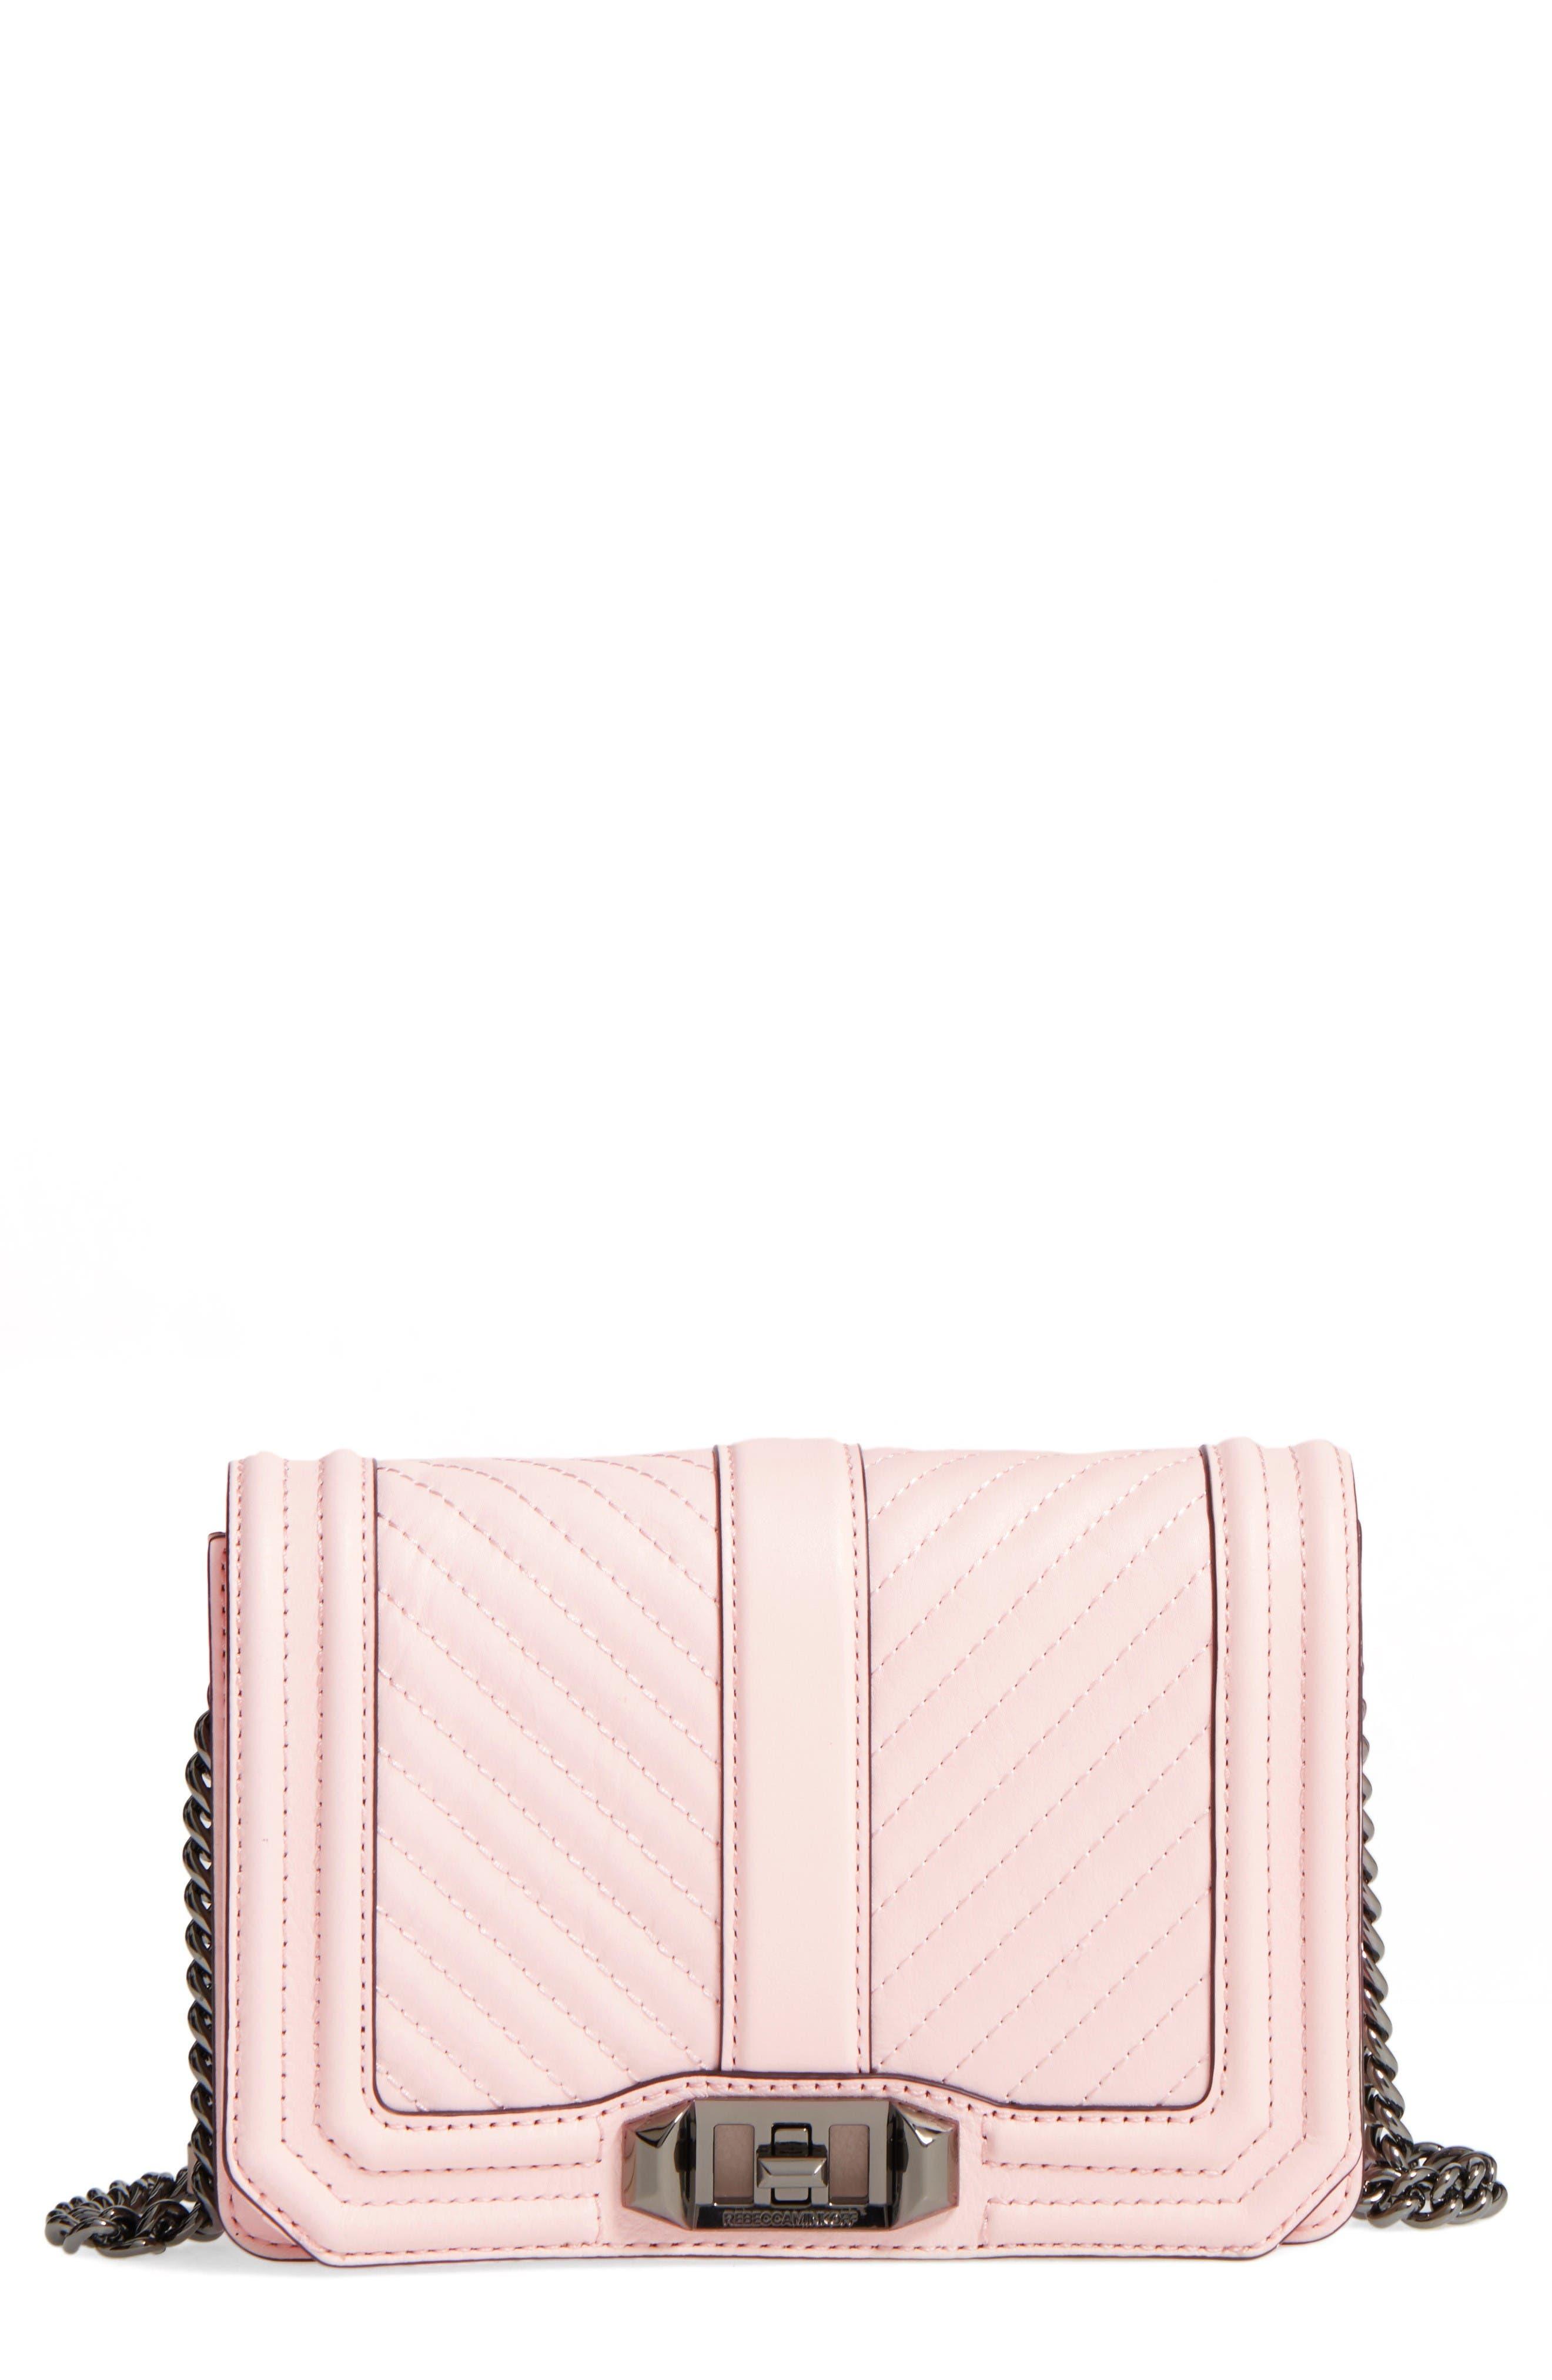 Small Love Leather Crossbody Bag,                         Main,                         color, Soft Blush/ Gunmetal